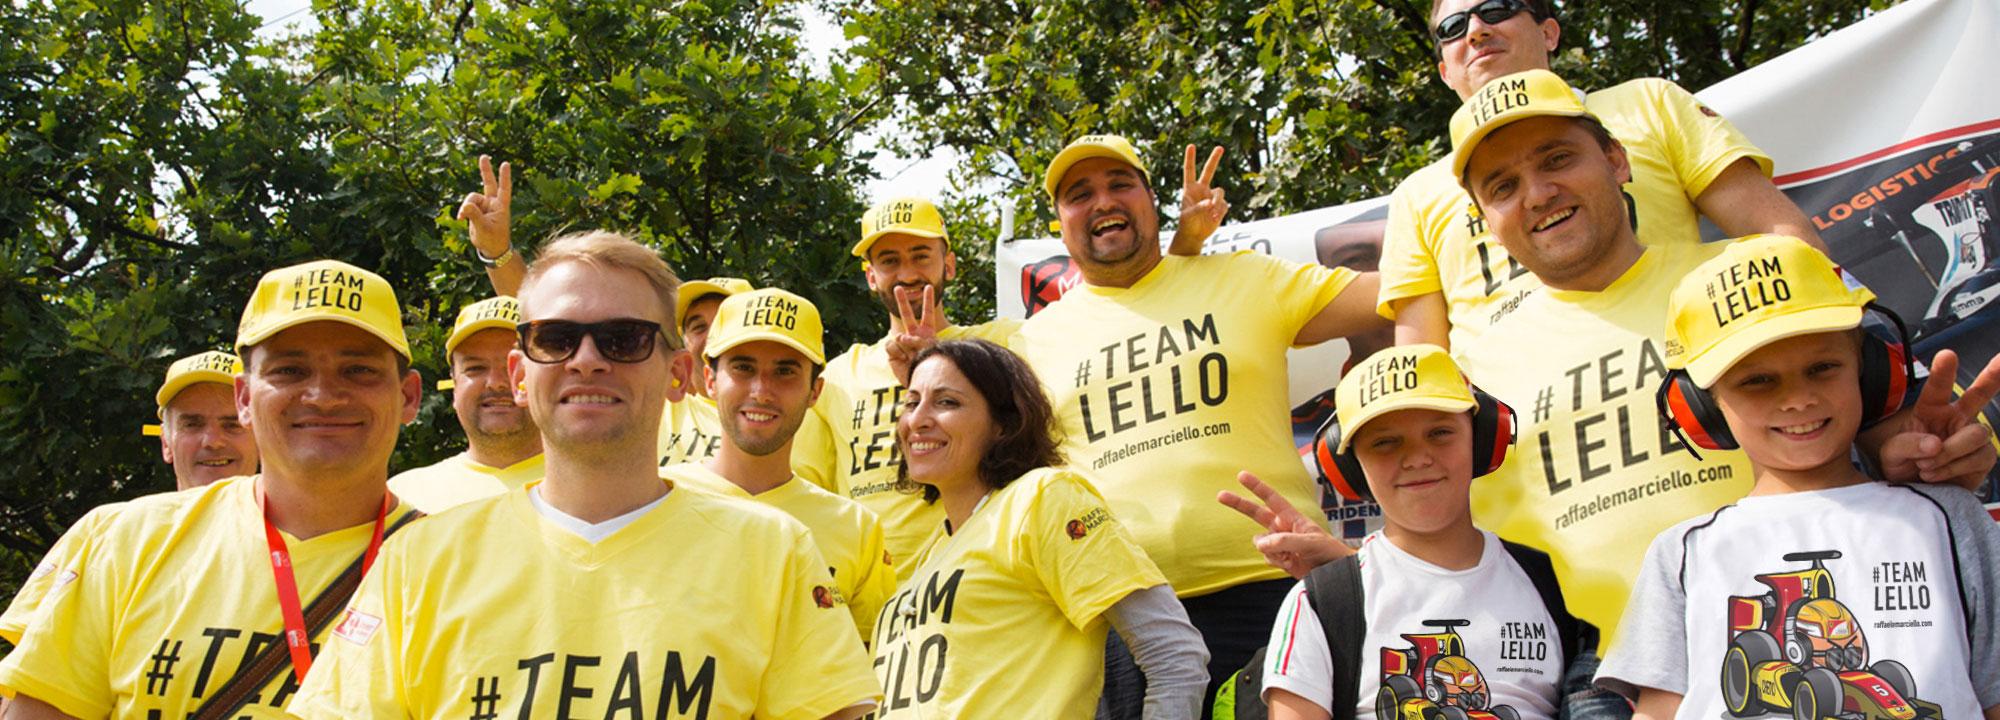 Team Lello